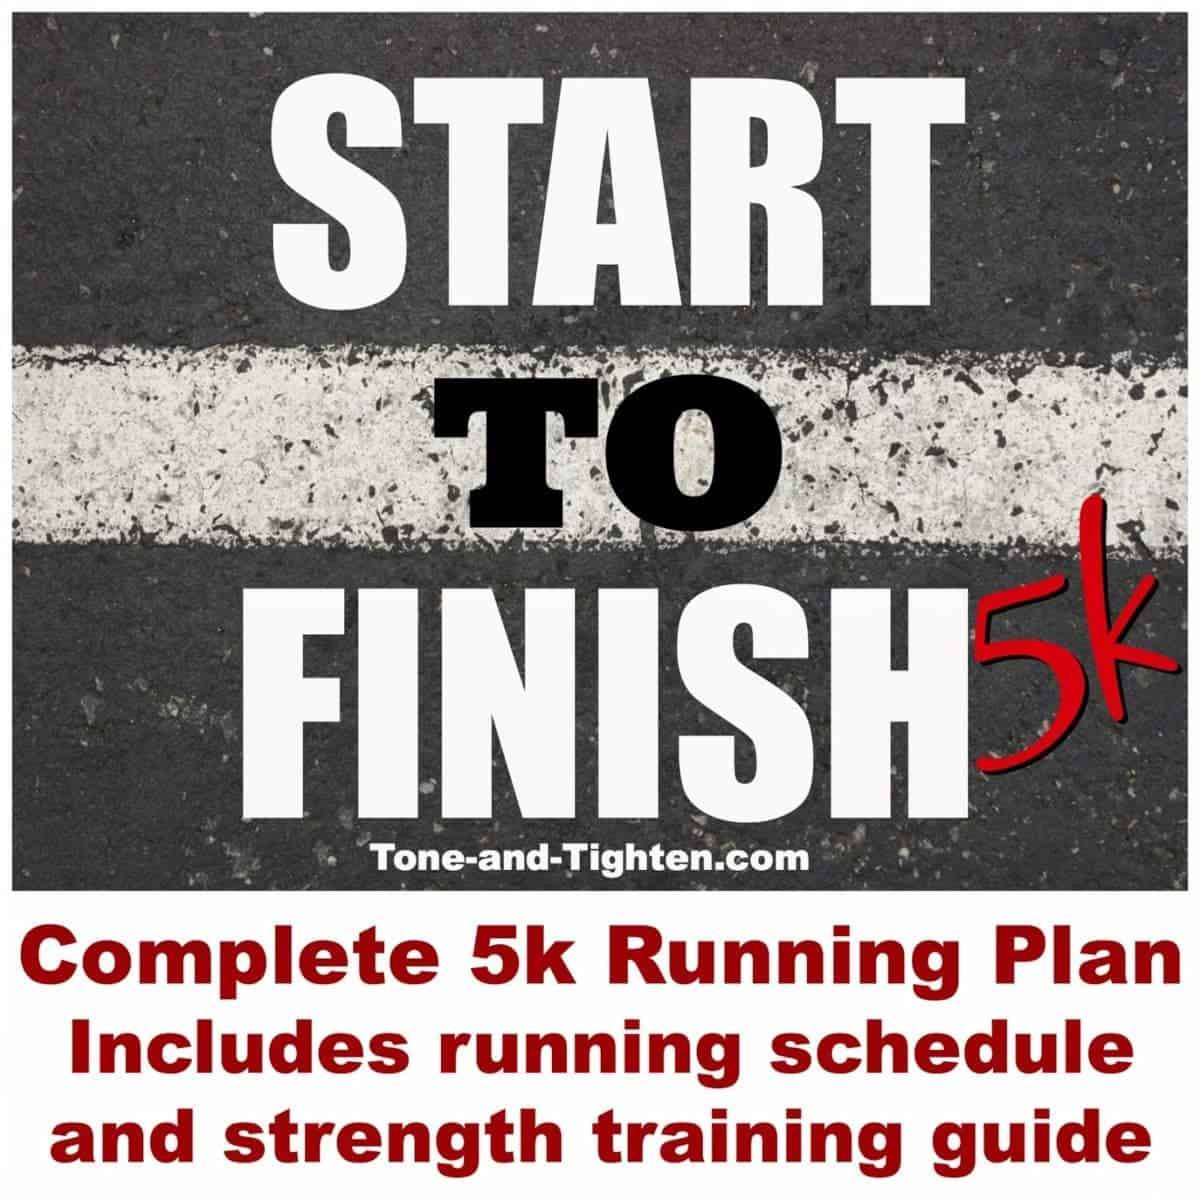 5k-run-running-plan-guide-couch-to-5k-running